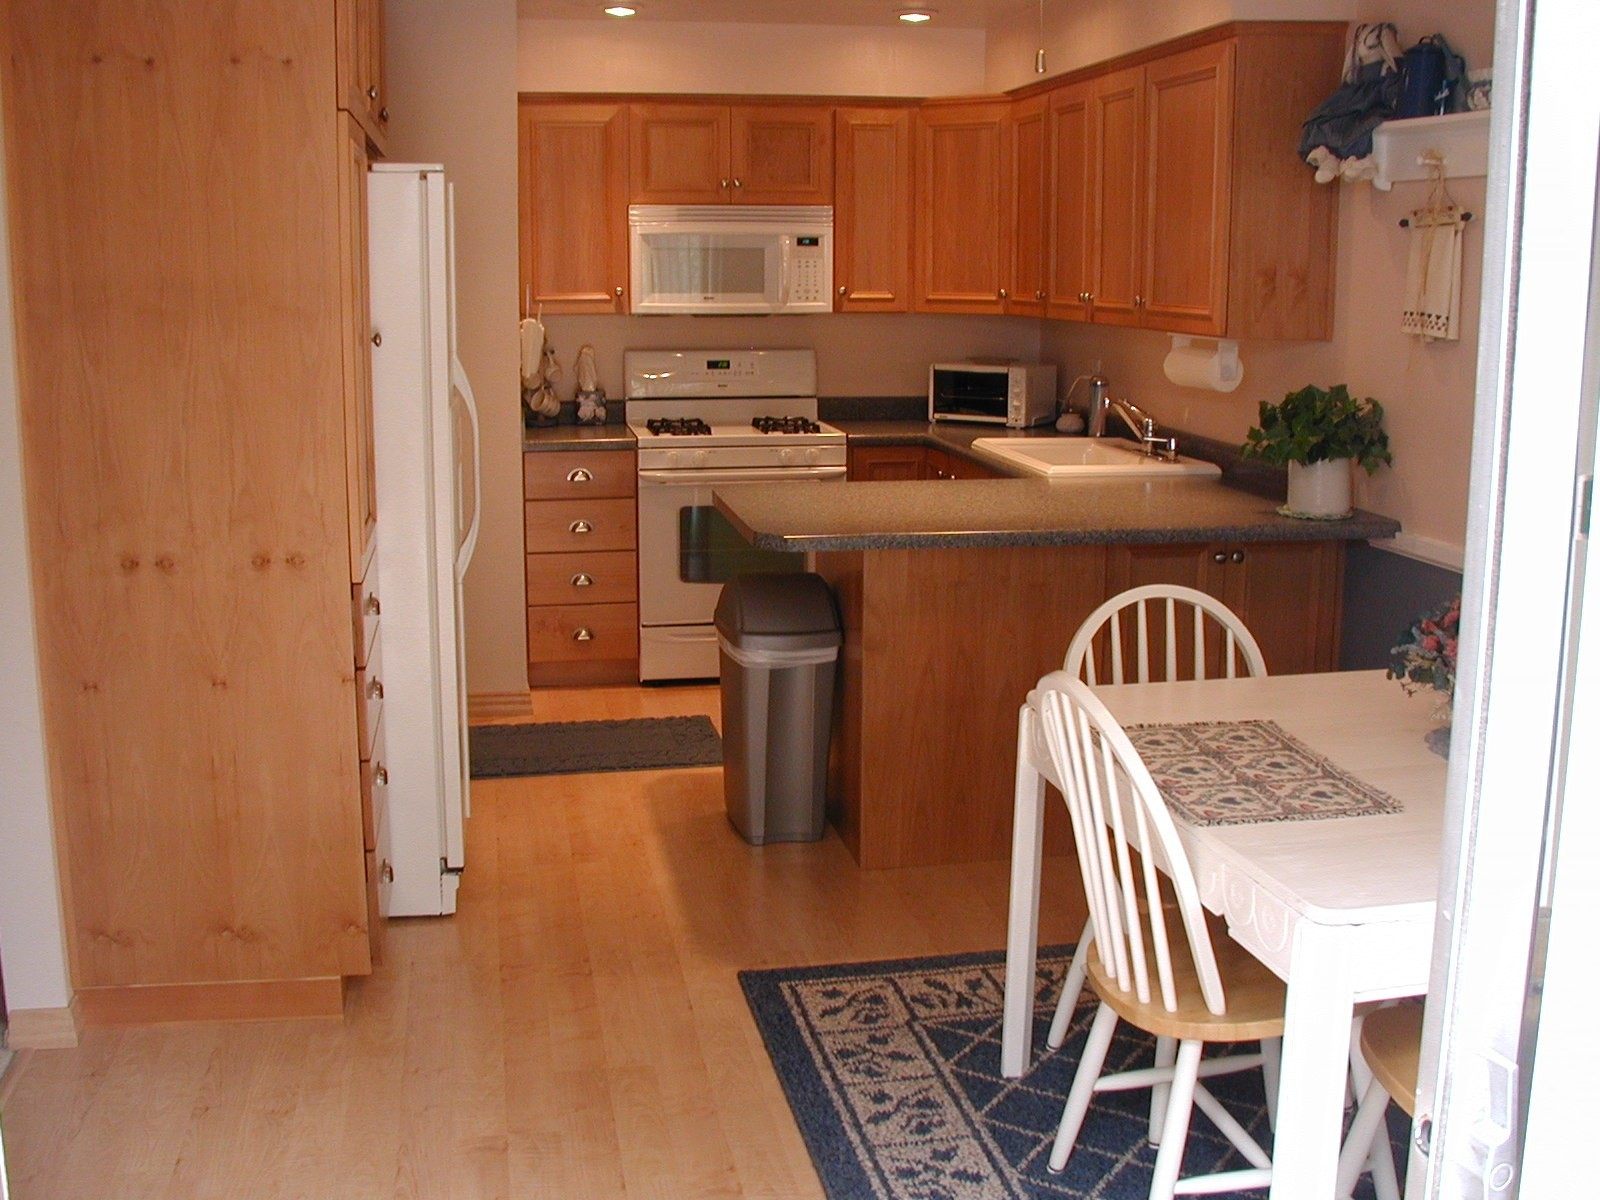 color wood floors 3 kitchen wood floors color of wood floors kitchen 6